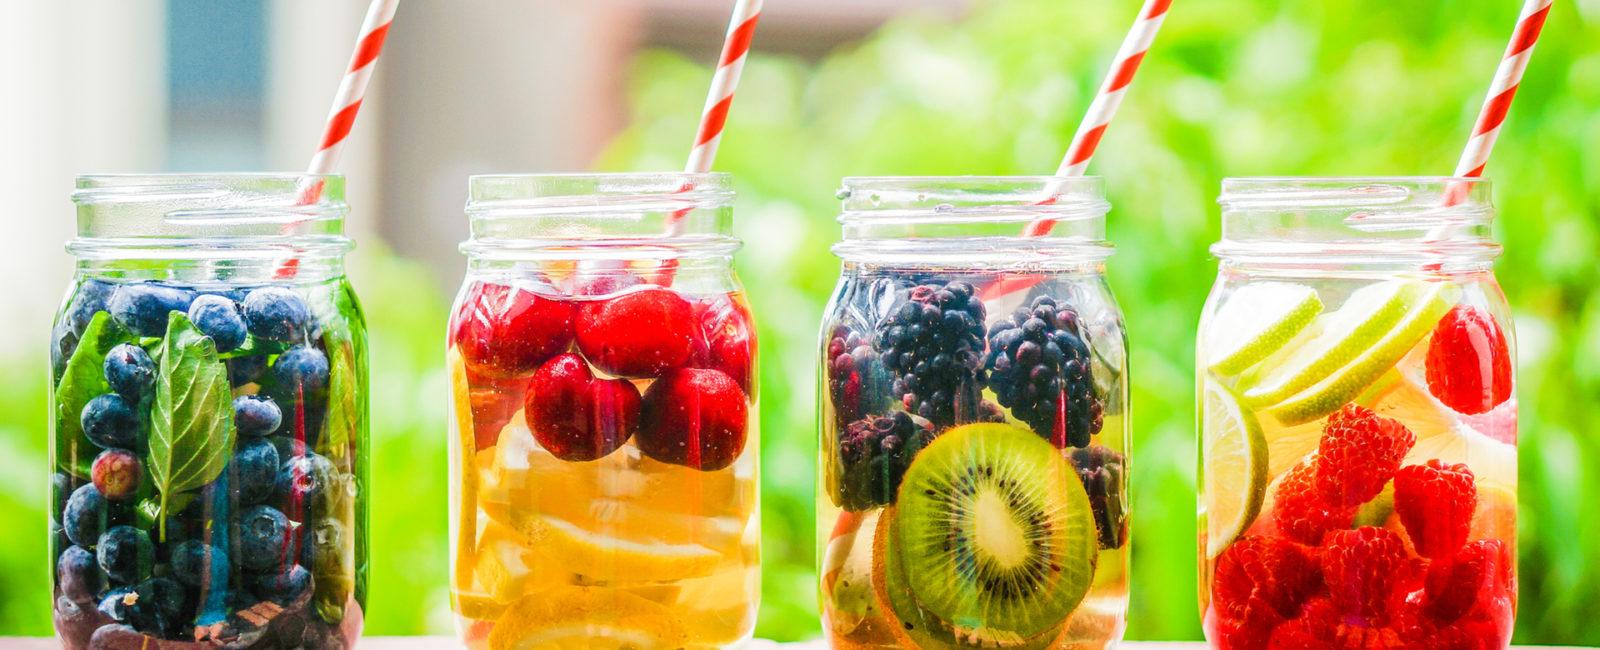 Detox-Wasser-Cocktail Anleitung